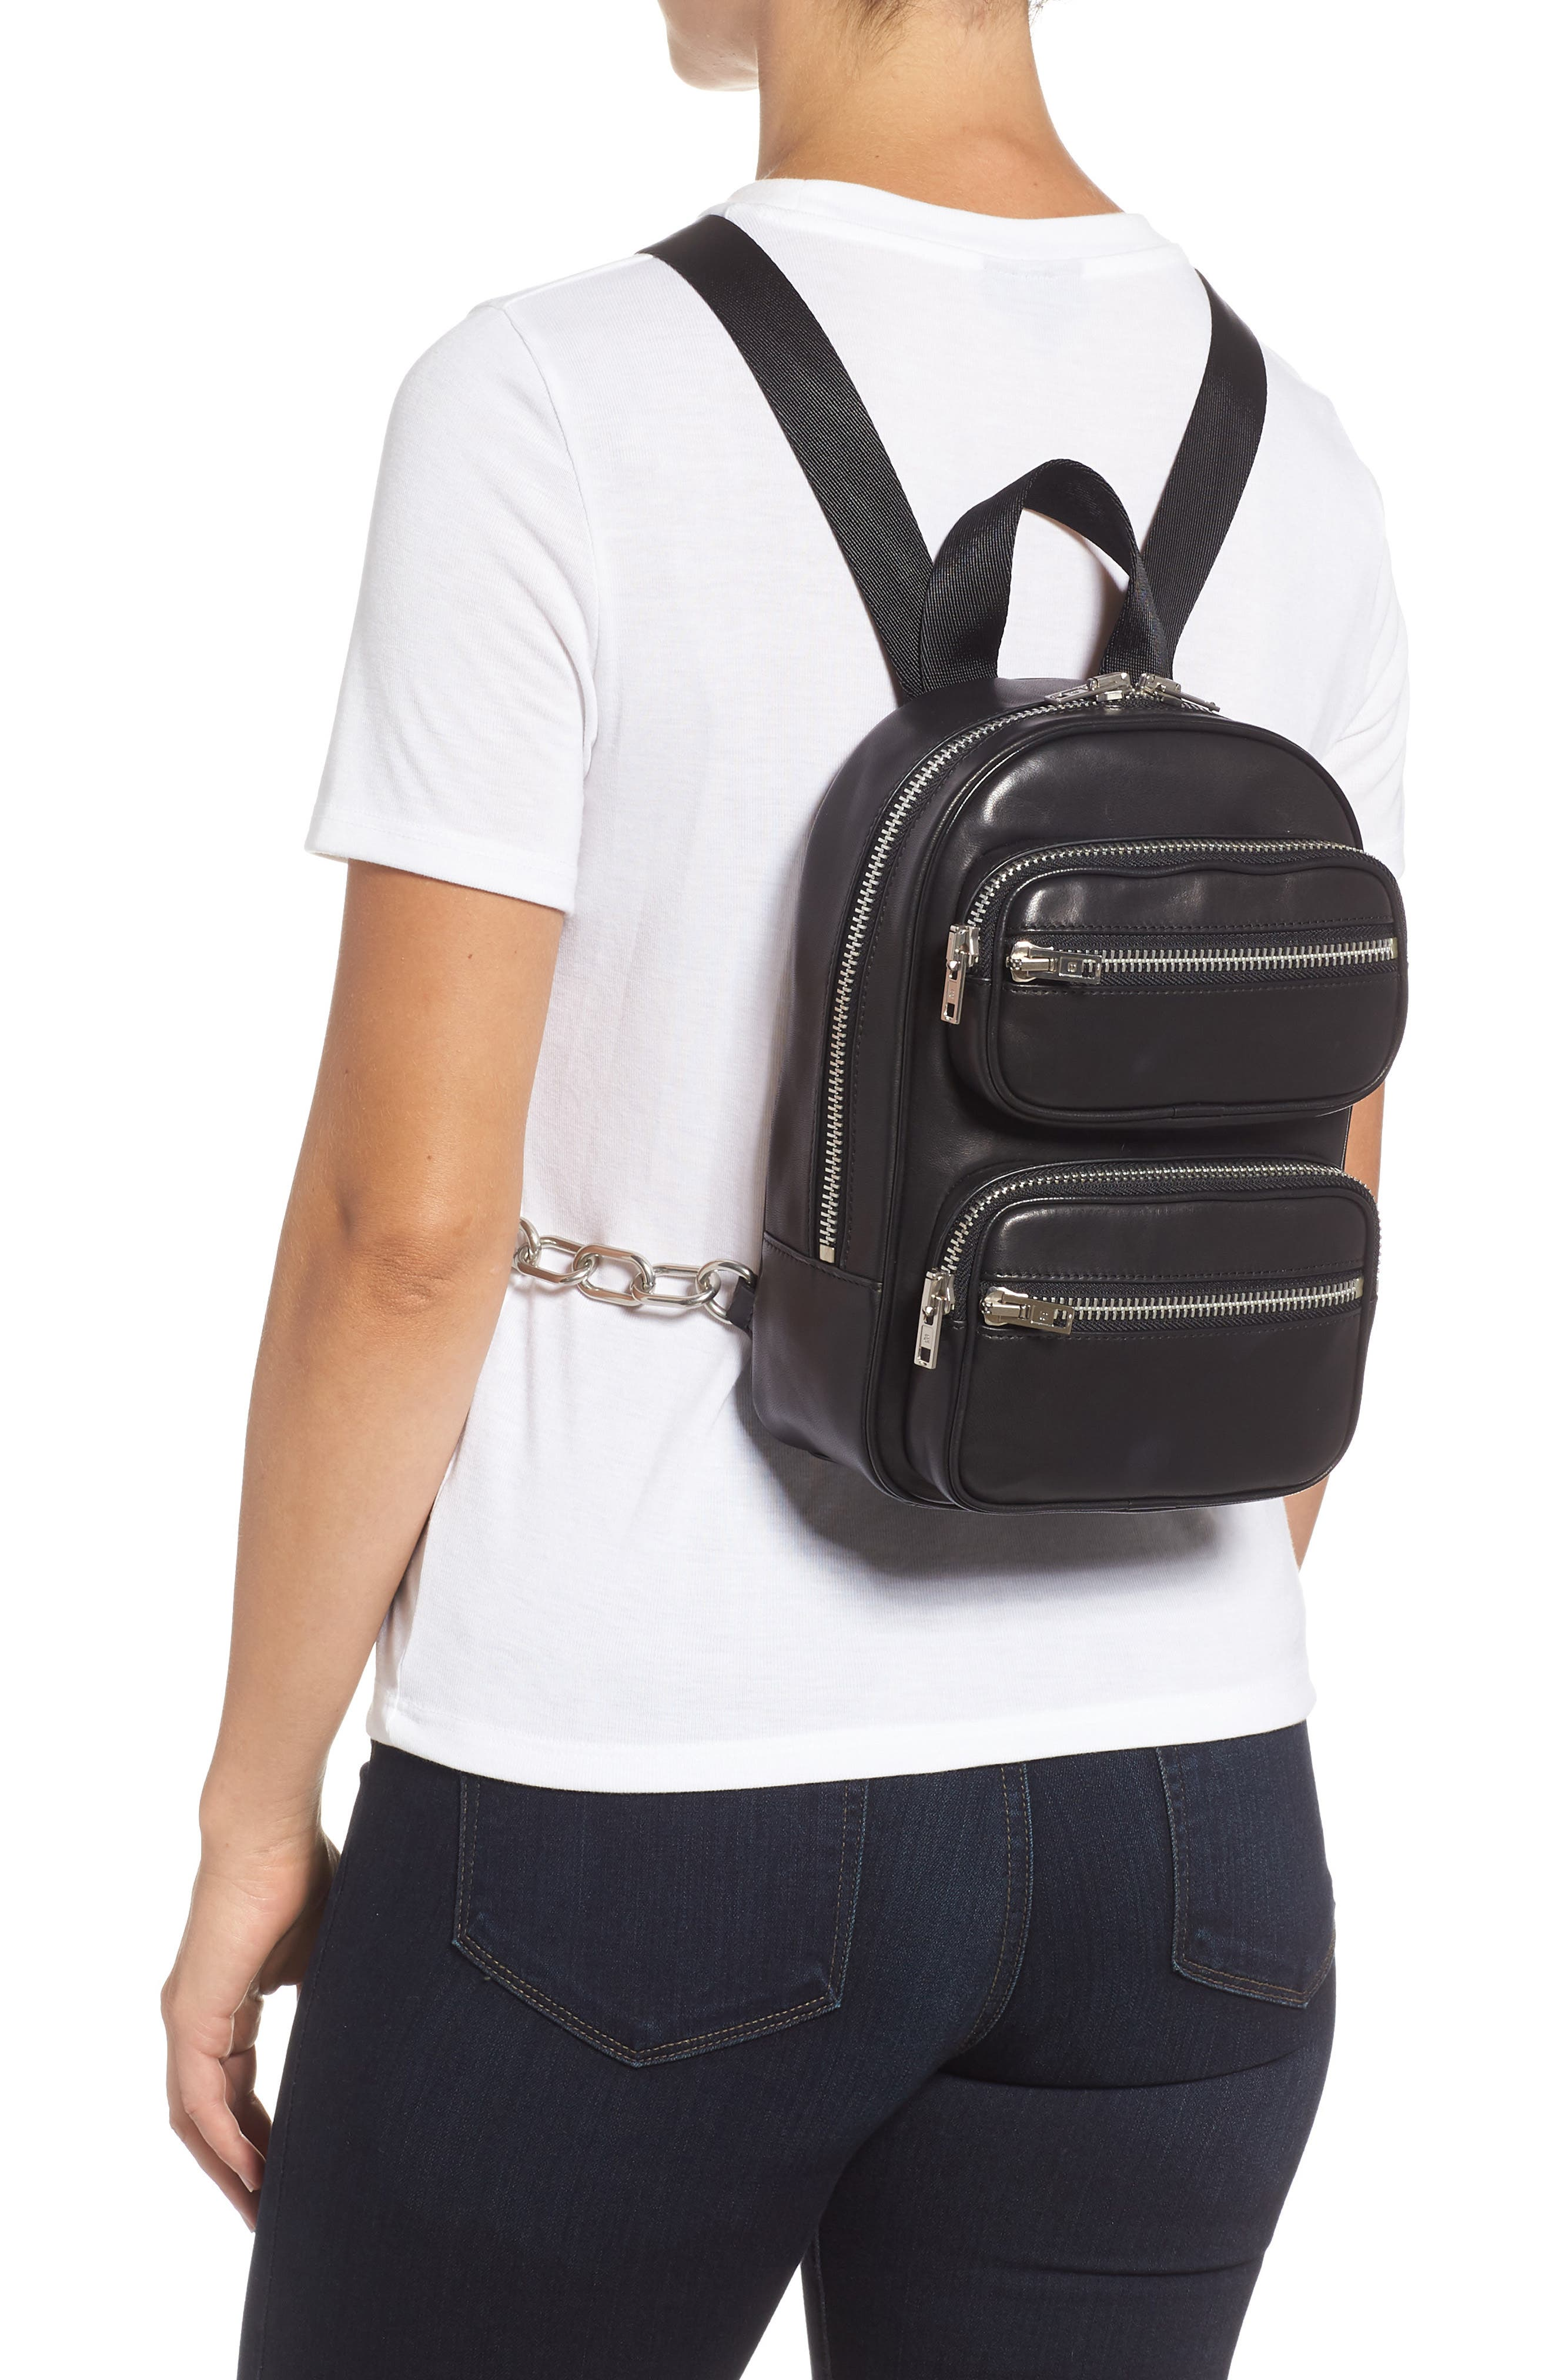 ALEXANDER WANG, Attica Lambskin Leather Backpack, Alternate thumbnail 2, color, BLACK